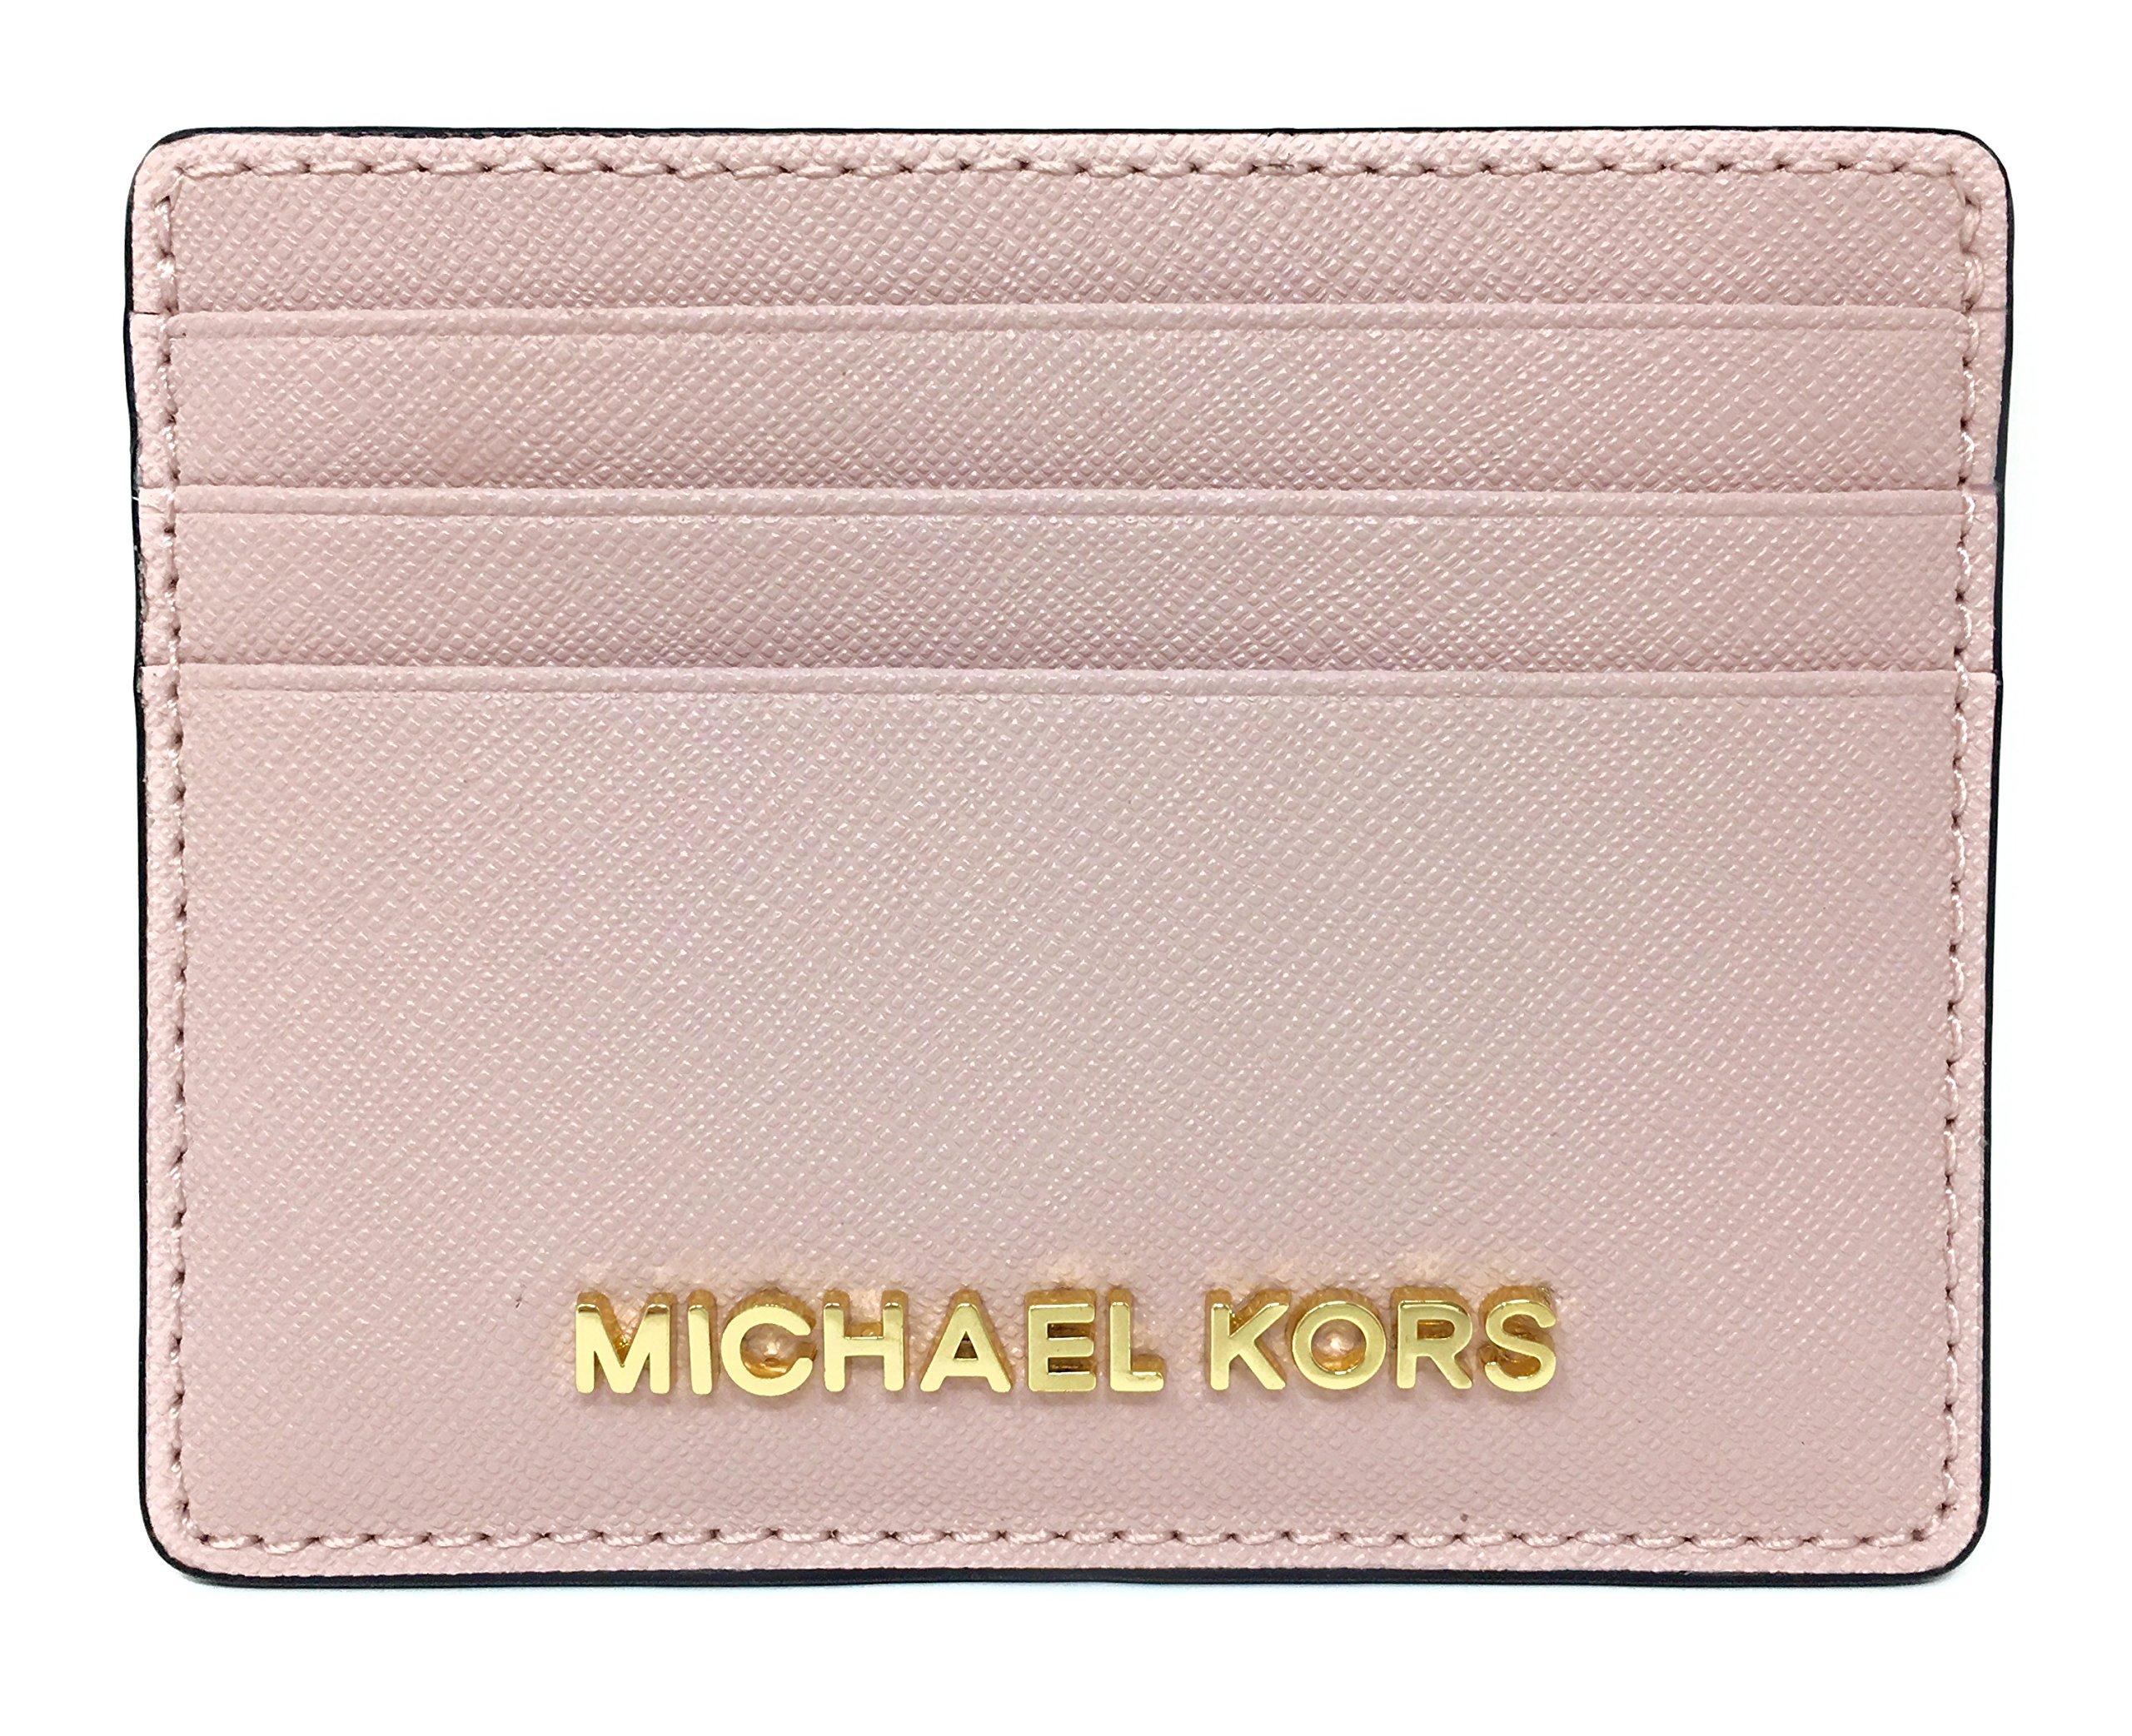 Michael Kors Jet Set Travel Large Saffiano Leather Card Holder (Blossom)